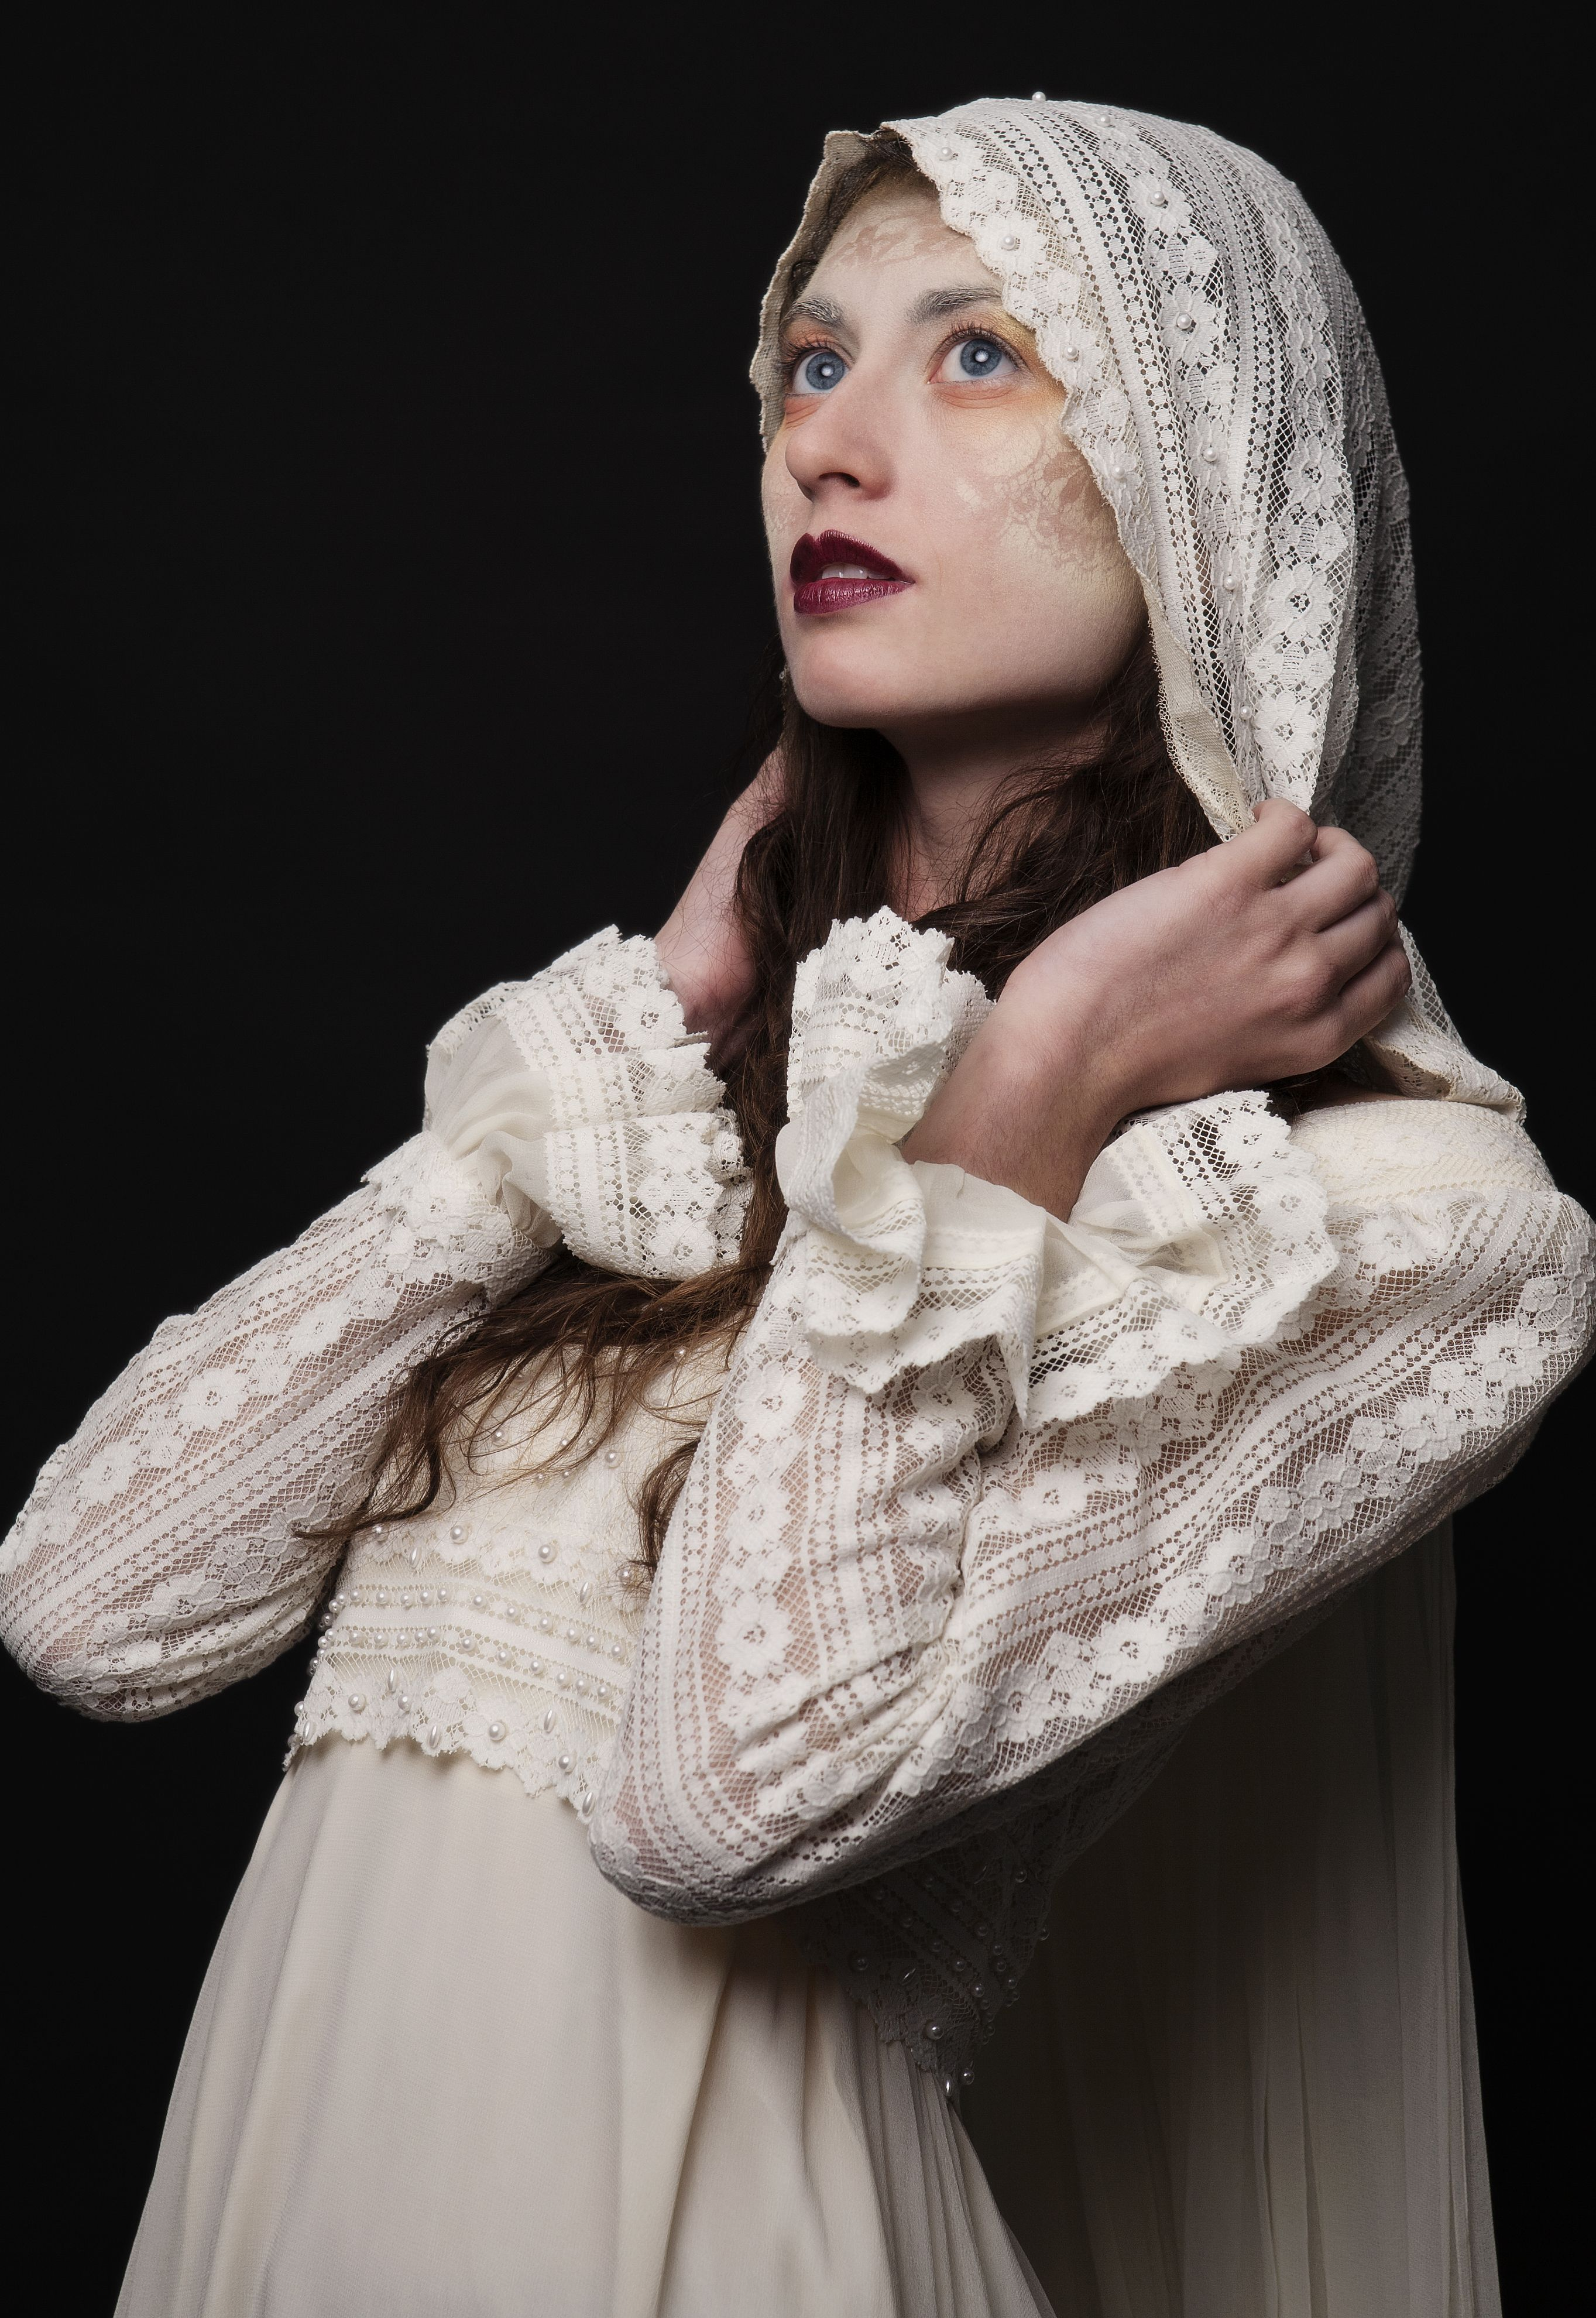 Boho bride for an elvish forest wedding vintage dress available at